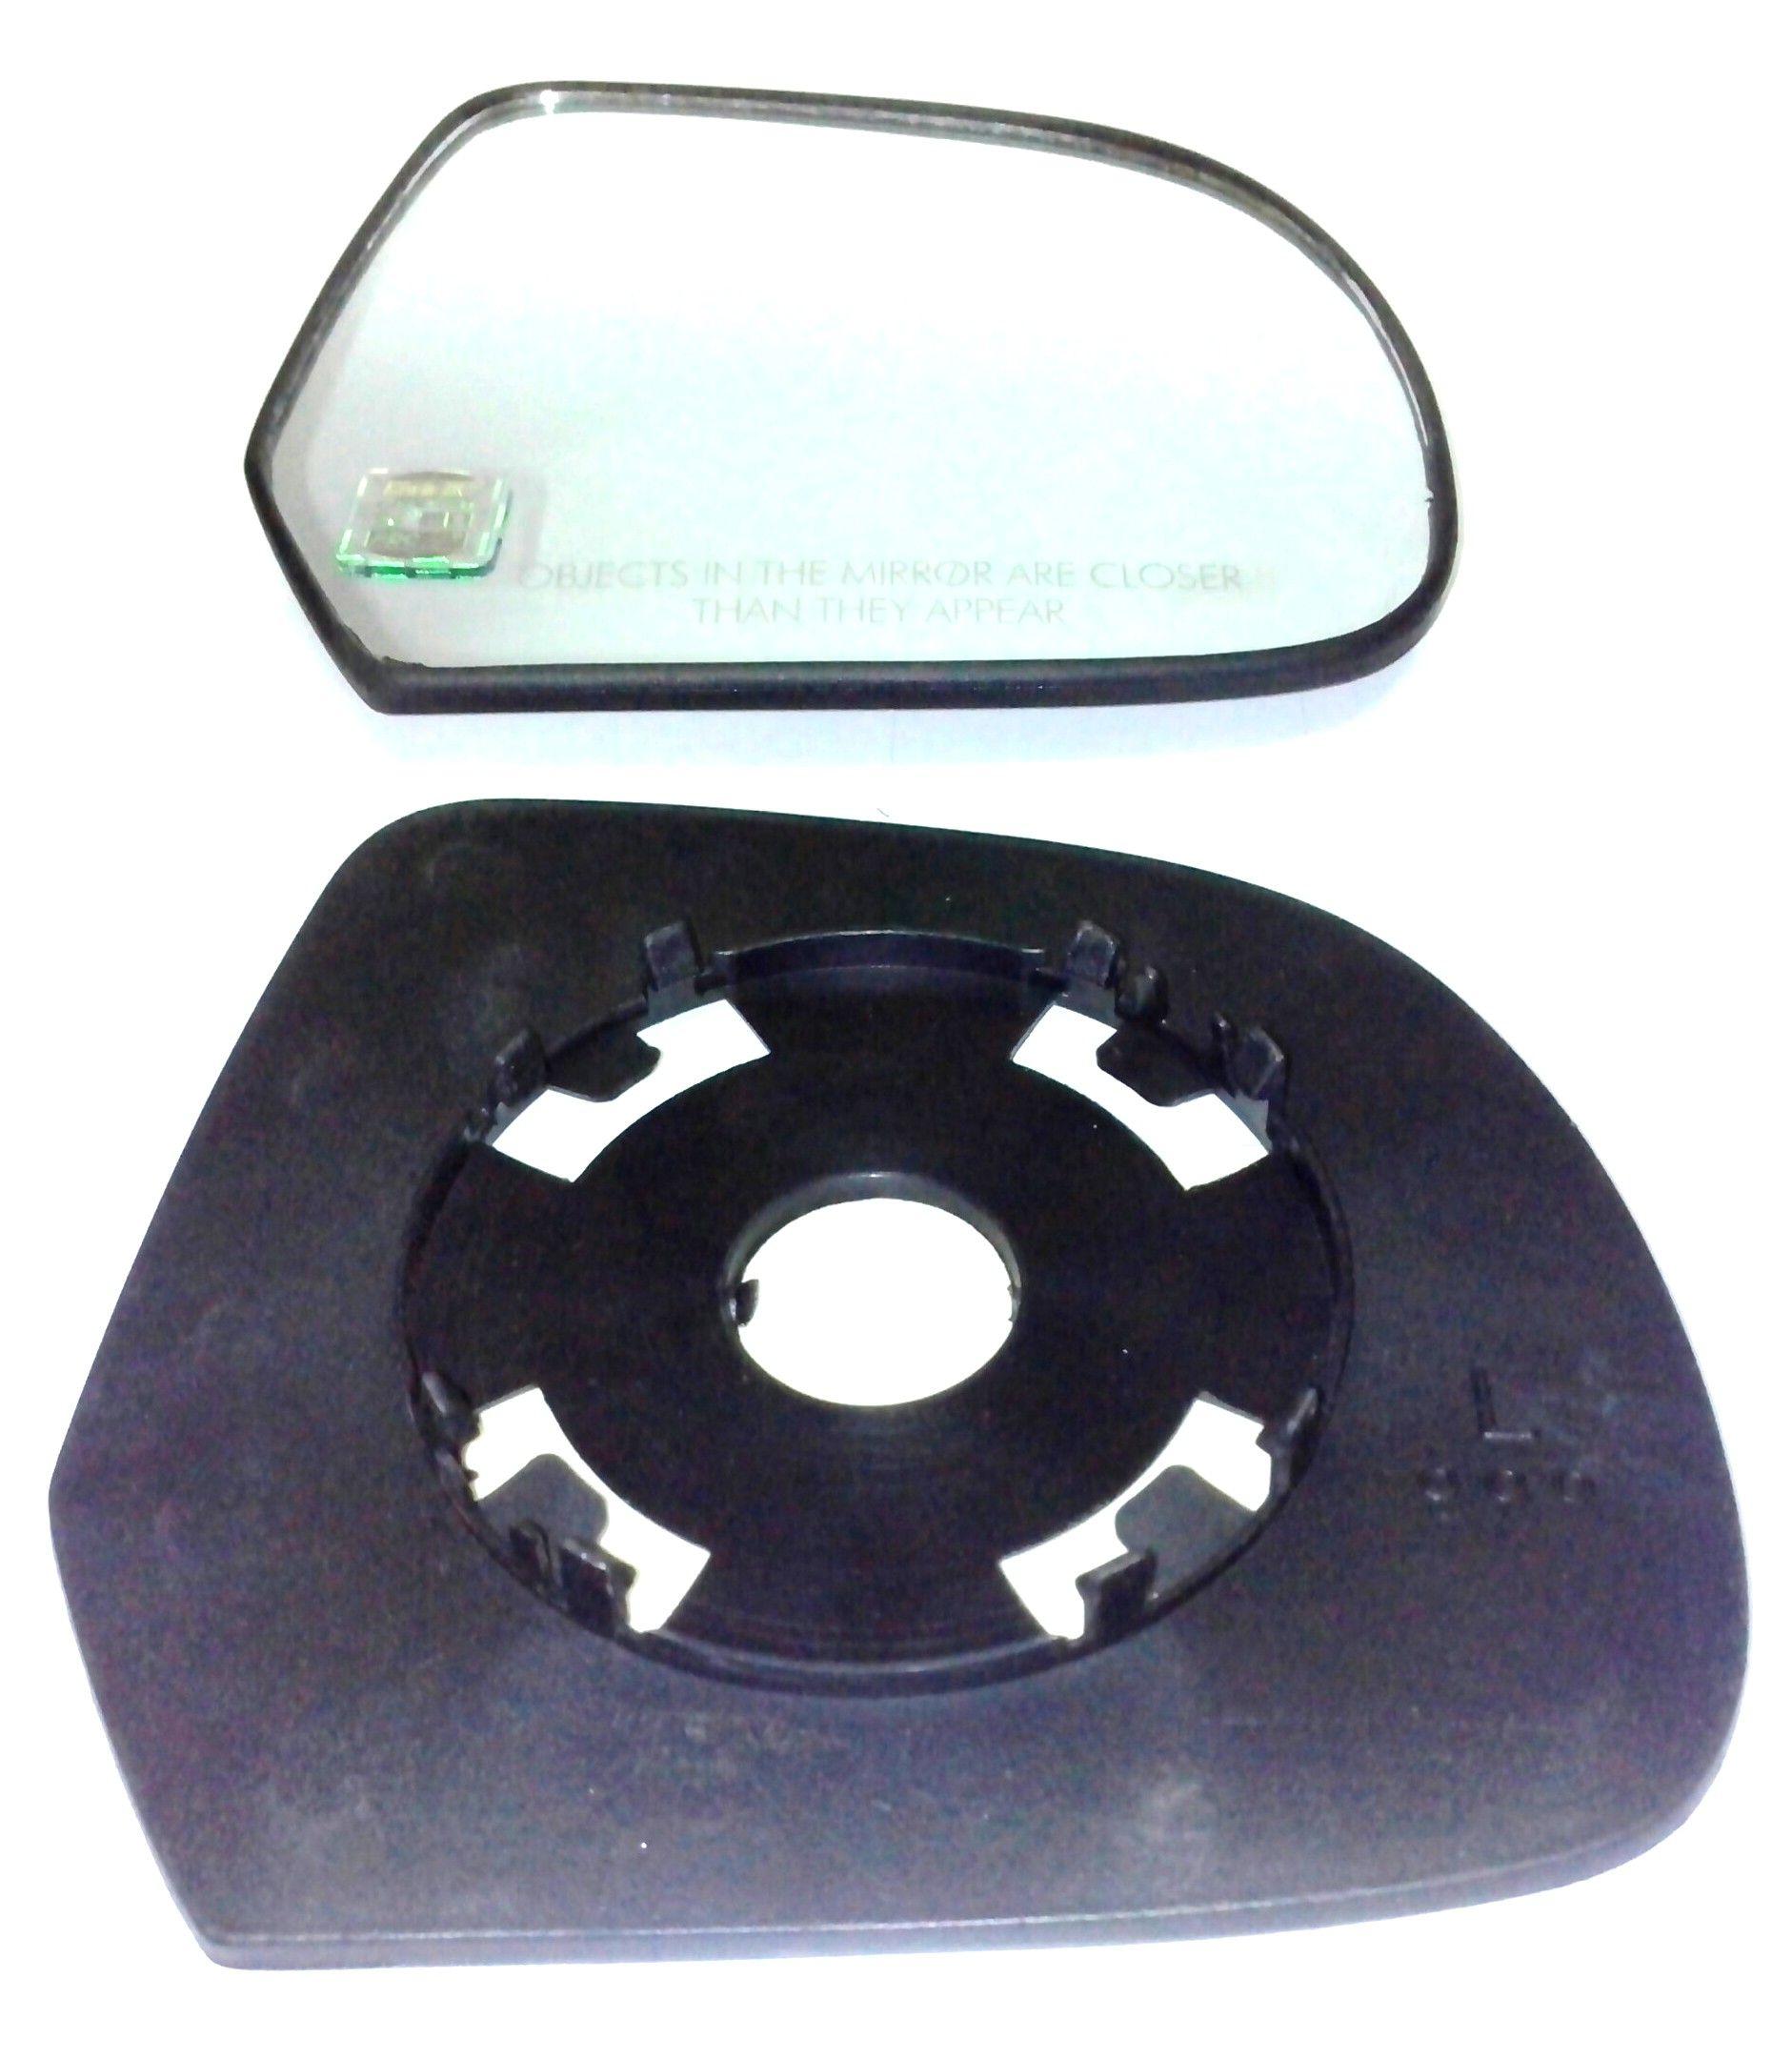 MANTRA-CONVEX MIRROR PLATES (SUB MIRROR PLATES) FOR HYUNDAI SANTRO XING LEFT SIDE